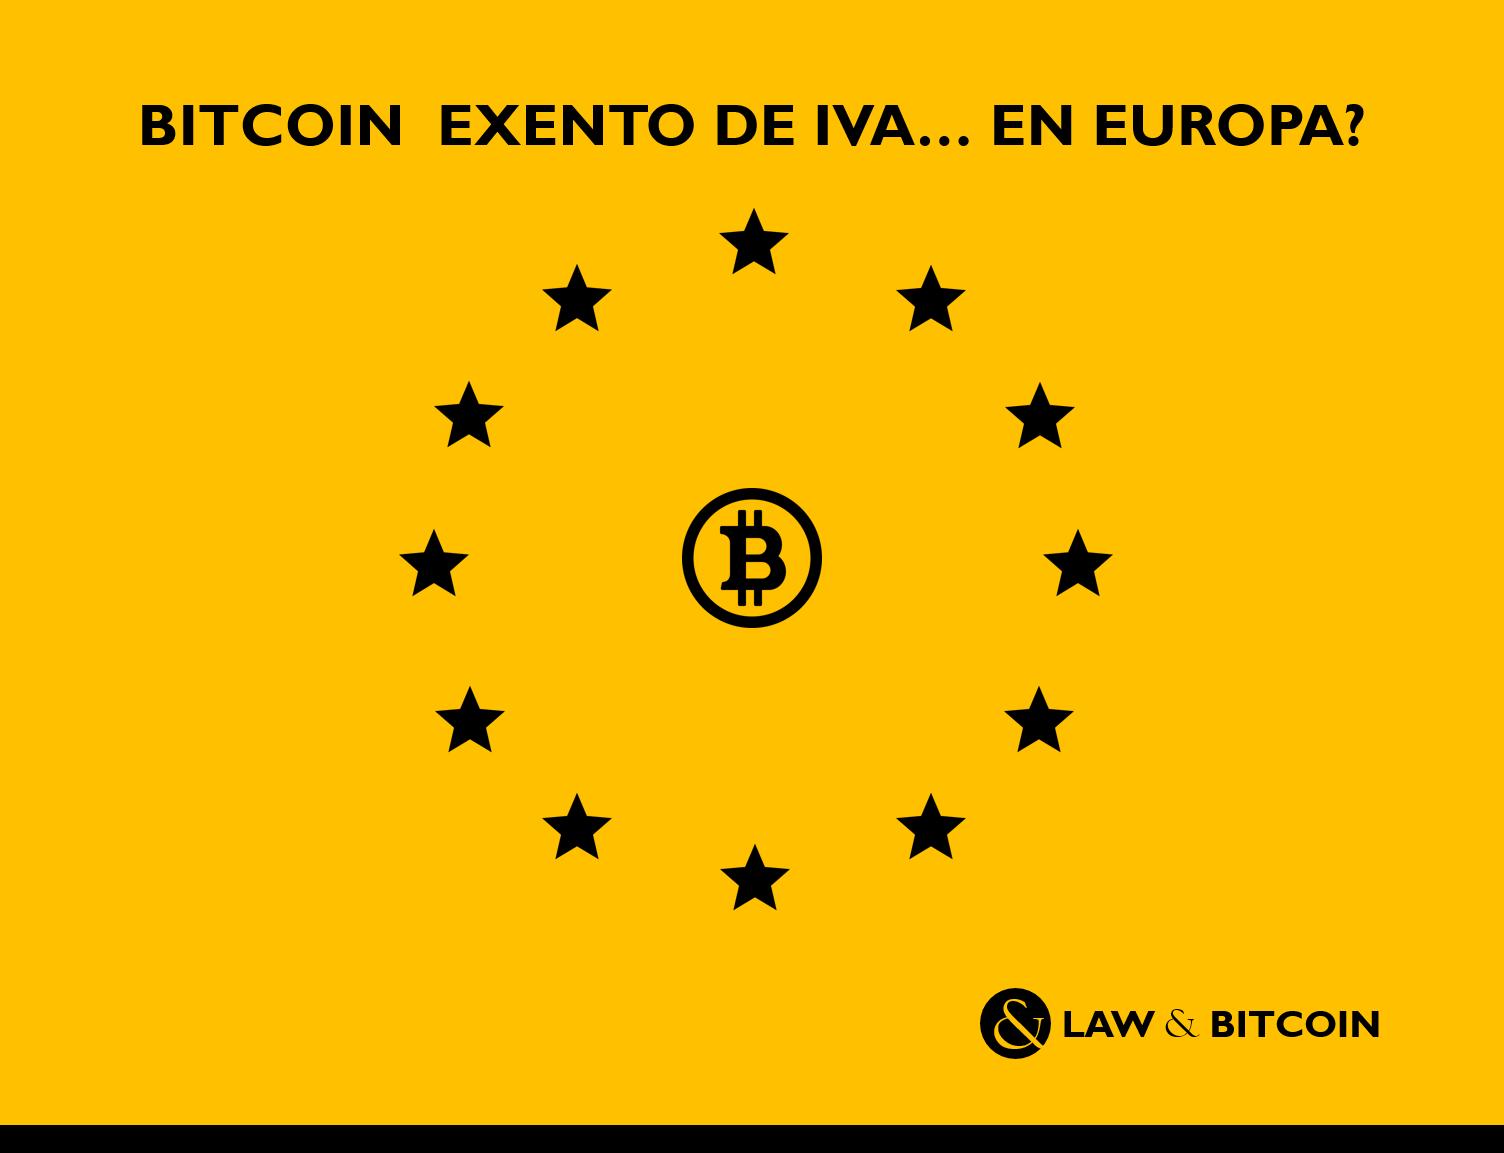 Bitcoin no vat Europe